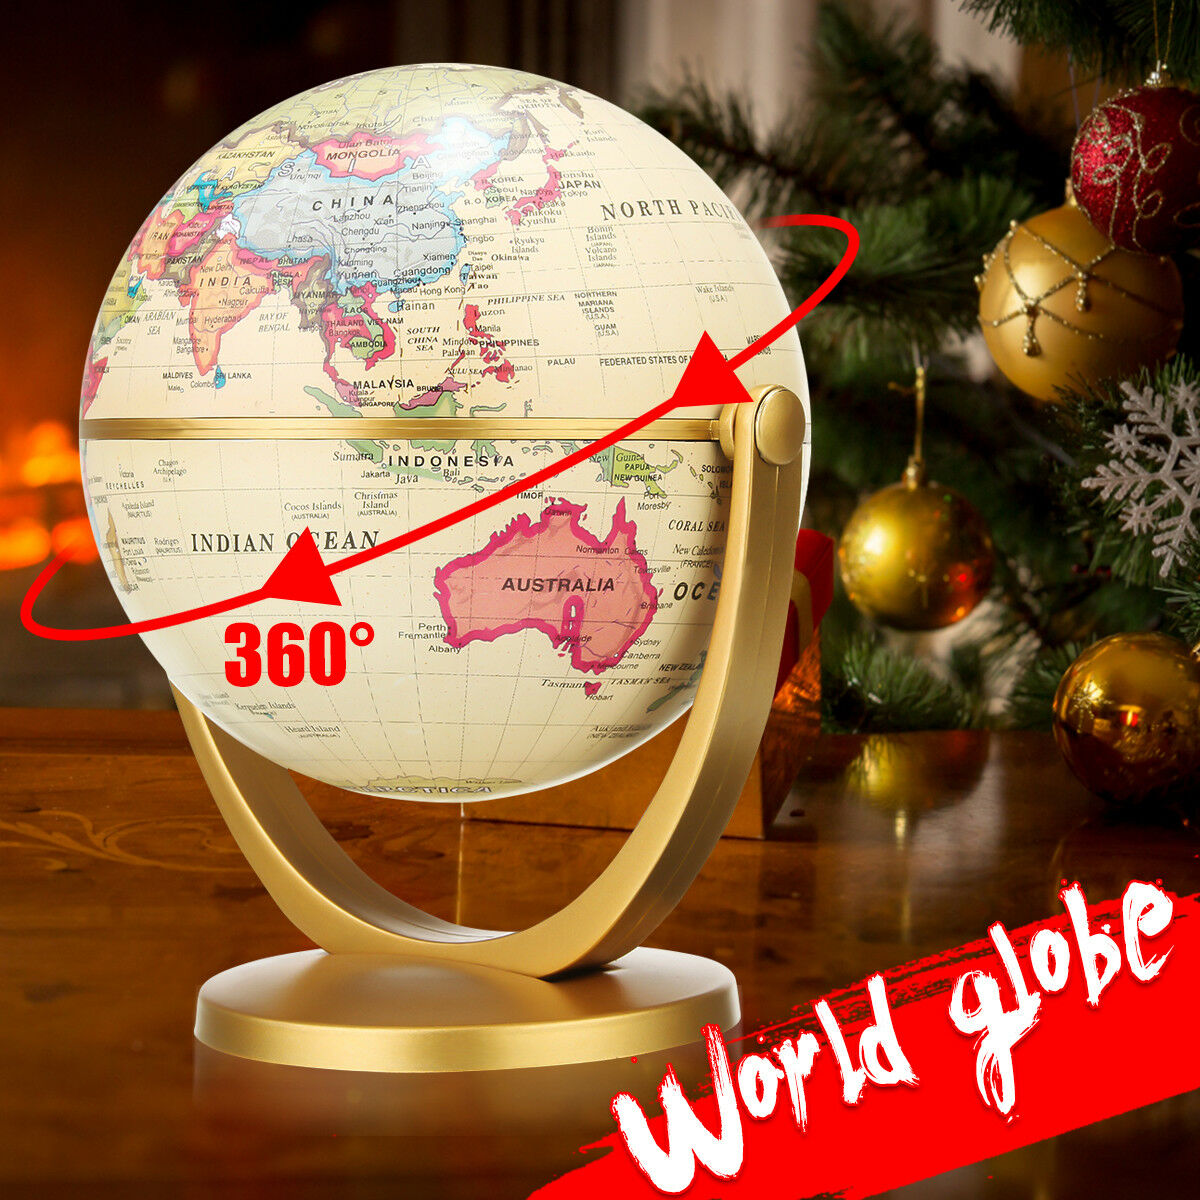 360° Rotating World Globe Earth Antique Desktop Geography Educational Decoration